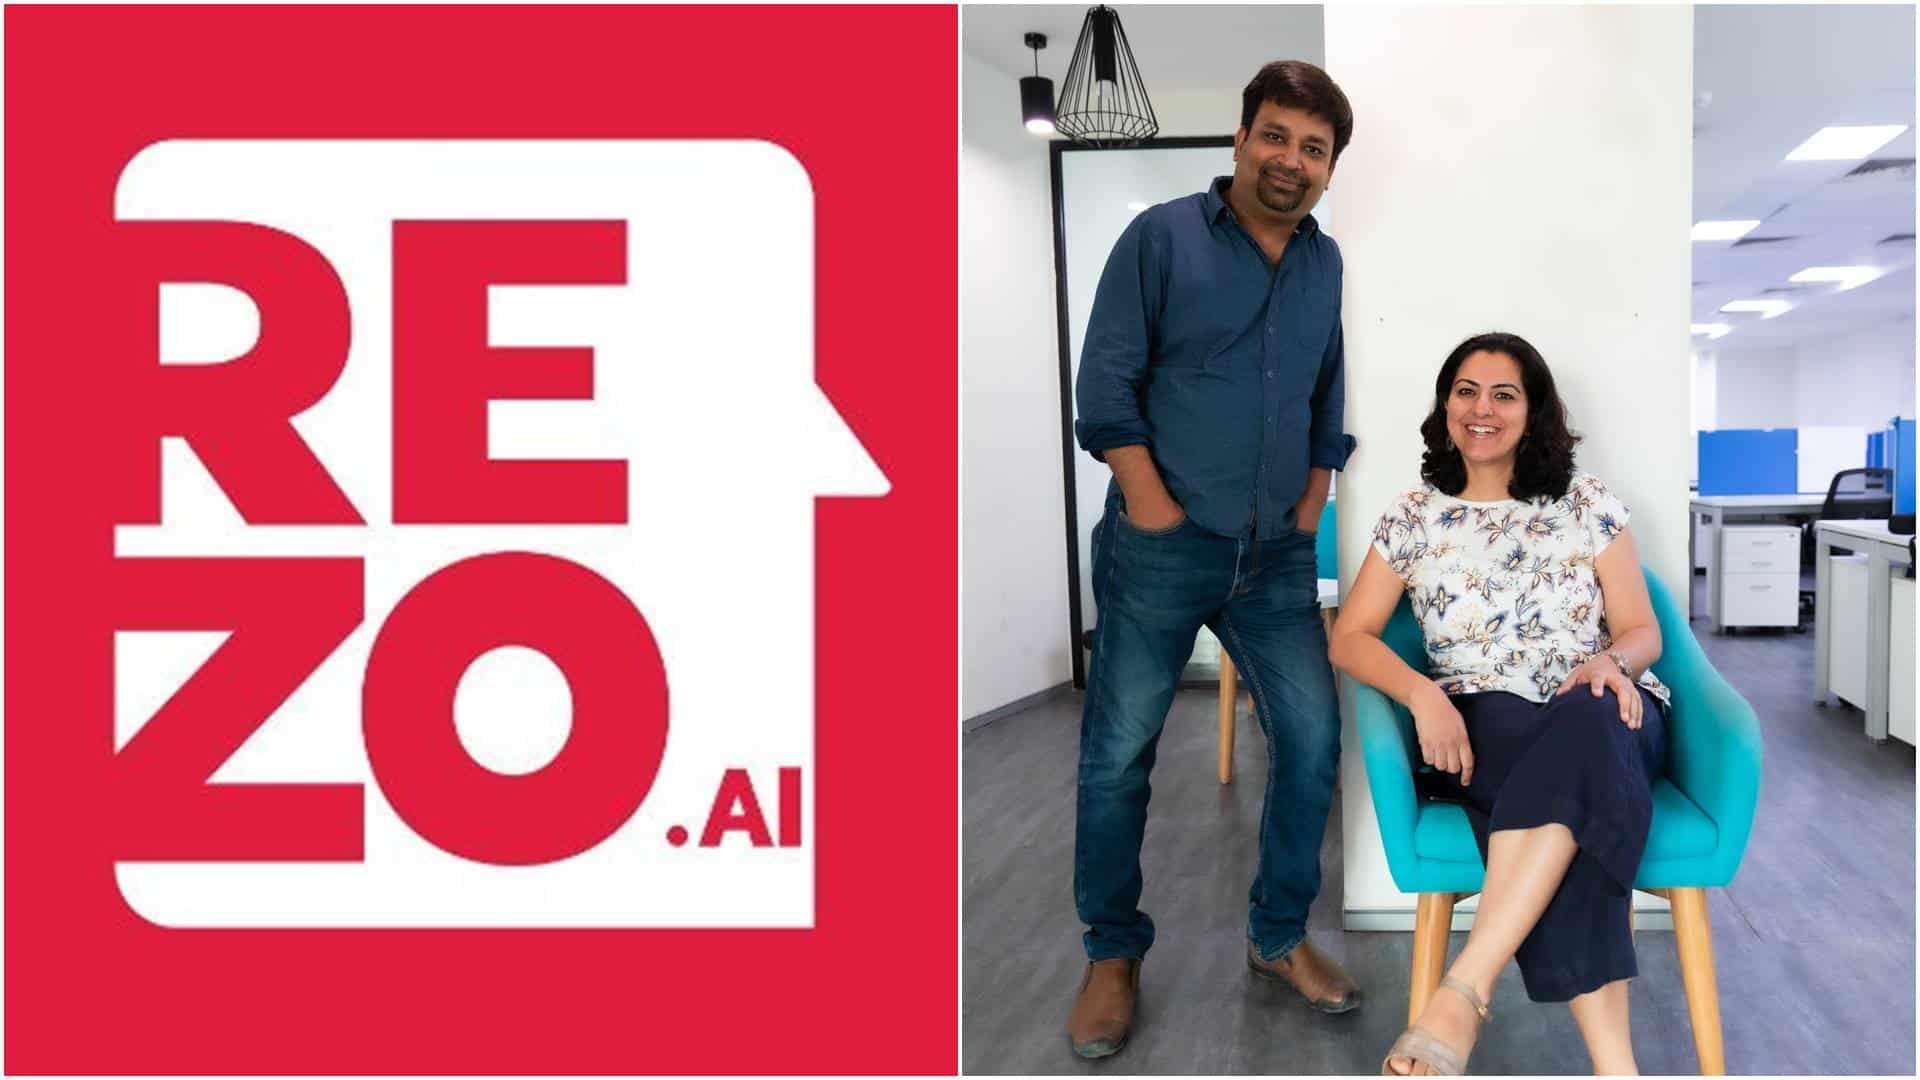 Manish & Rashi Gupta, Co-founders, Rezo.ai